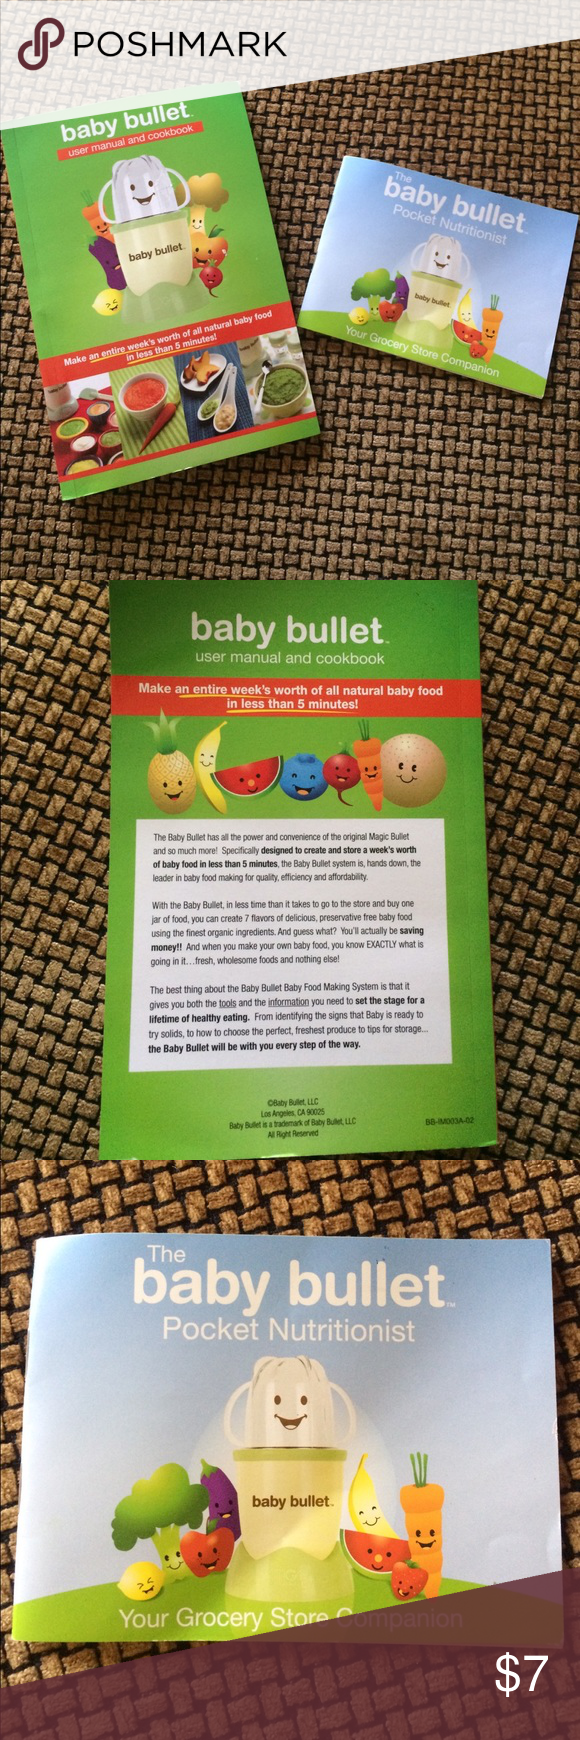 bundle baby bullet cookbook pocket nutritionist my posh closet rh pinterest com baby bullet user manual pdf baby bullet user manual pdf